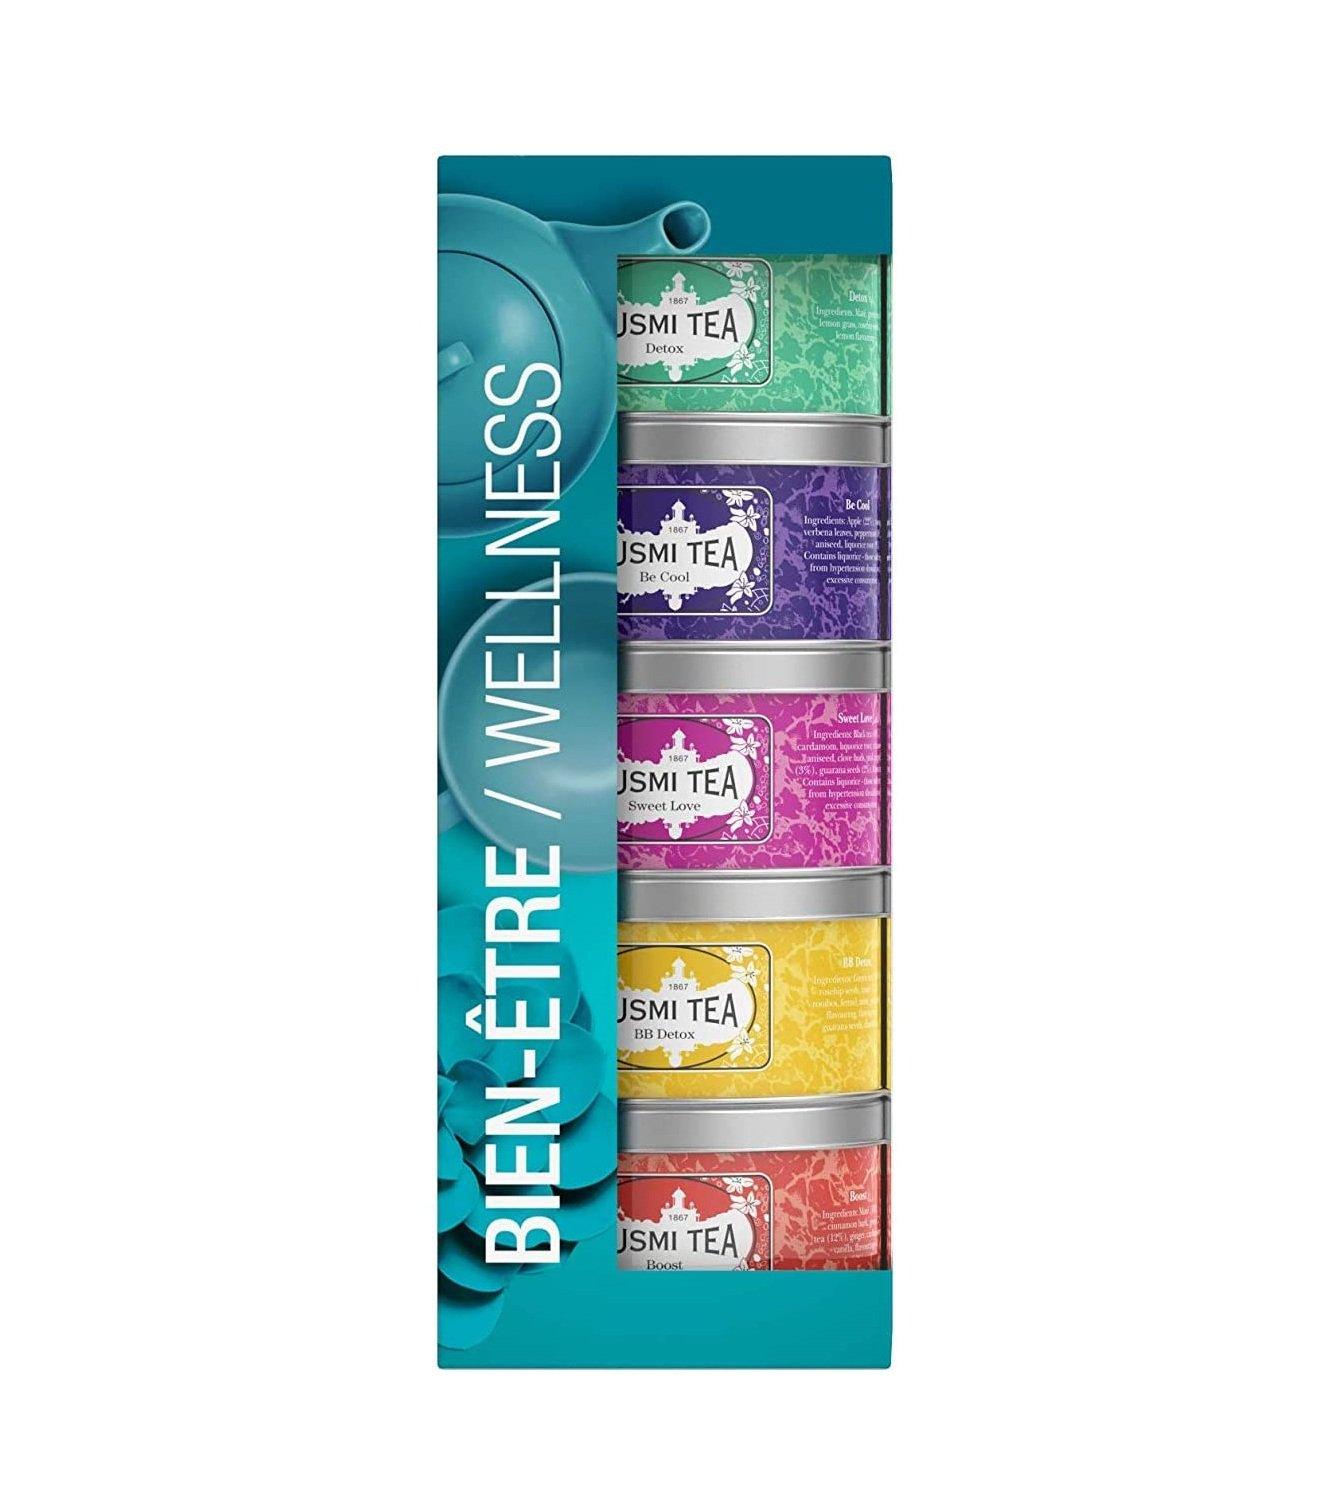 Kusmi Tea Paris - Wellness Teas Assortment 5x25g